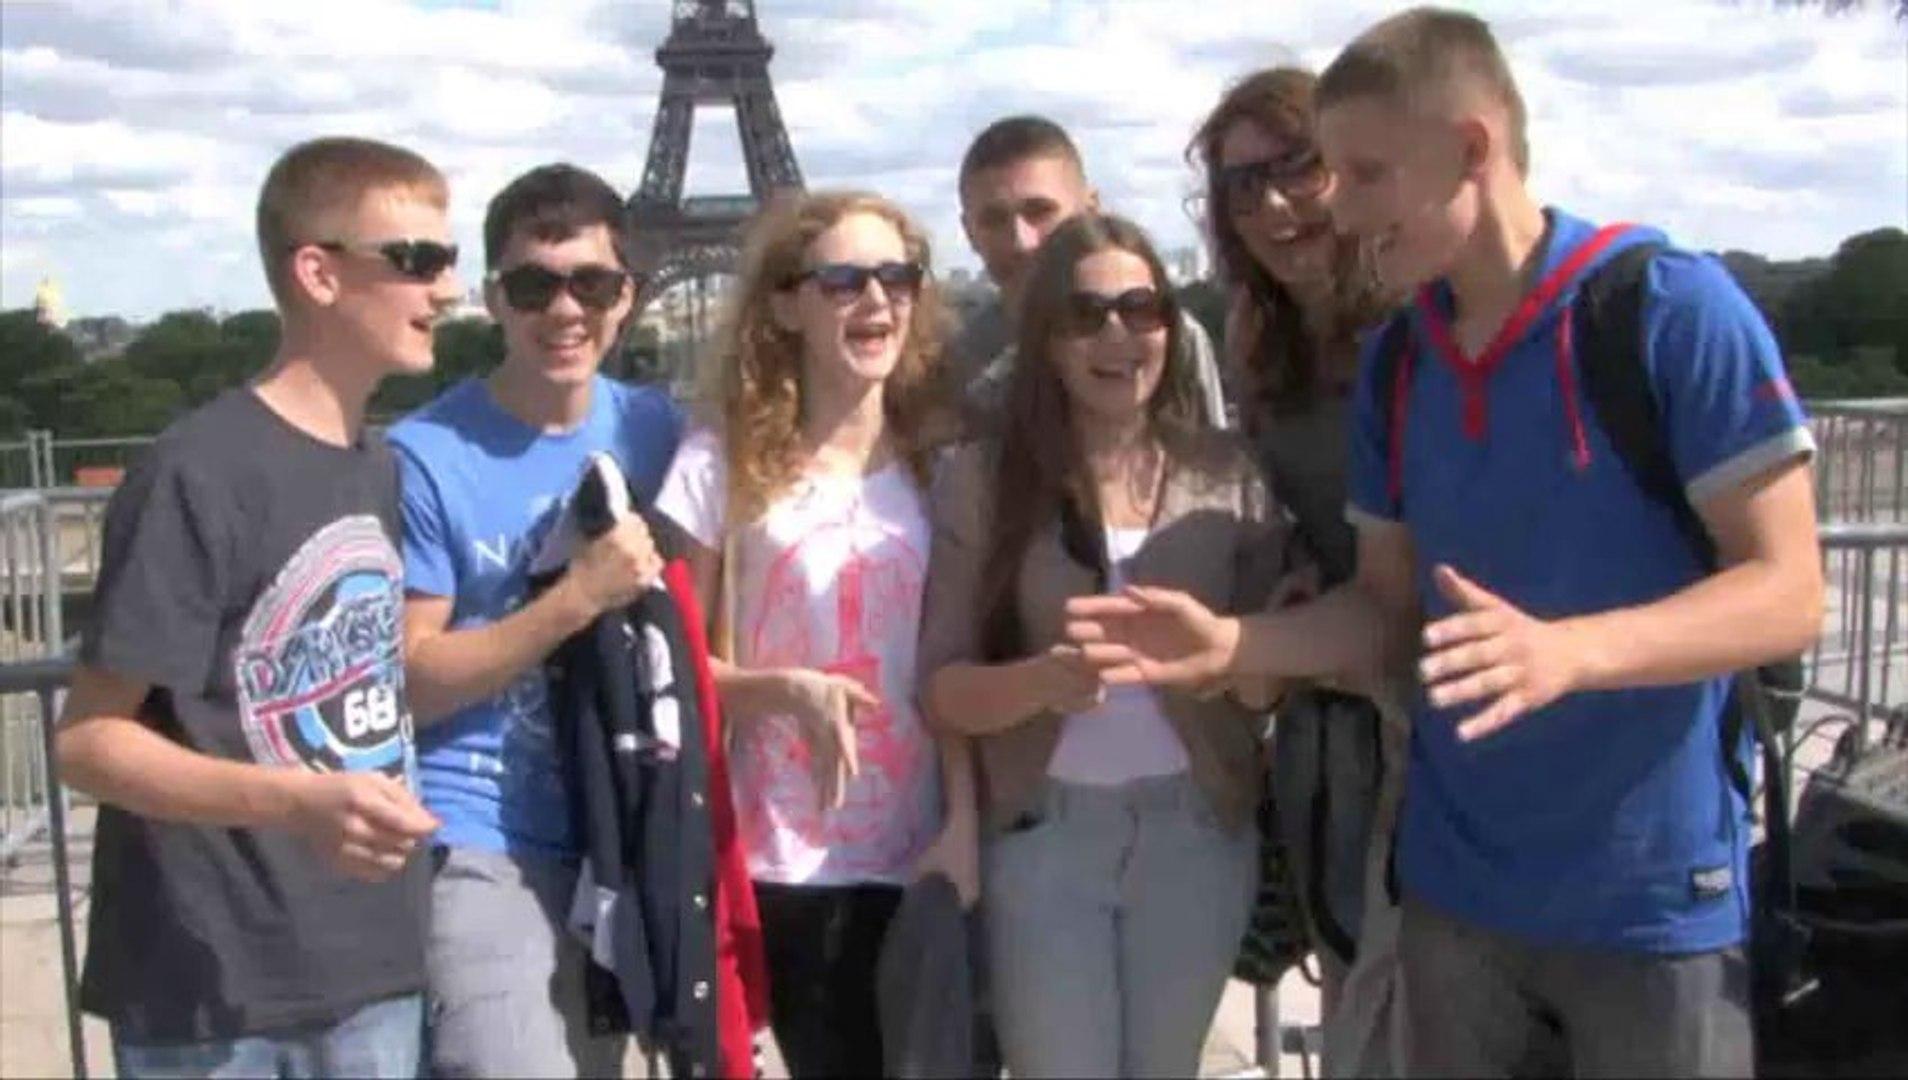 Международный фестиваль Paris, je t'aime! Париж, я люблю тебя! The Festival Official | The Official Organizer